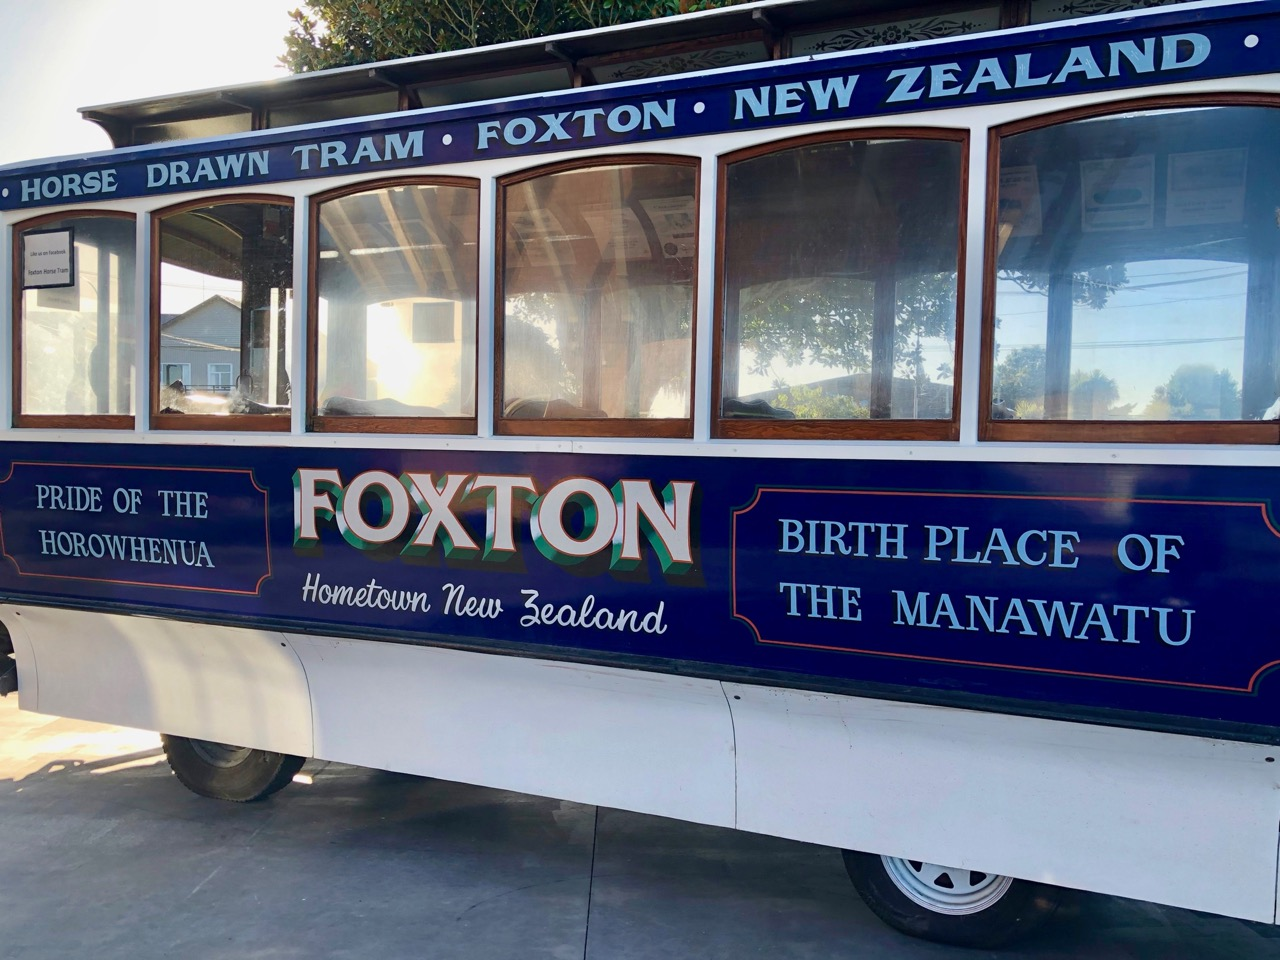 foxton tram